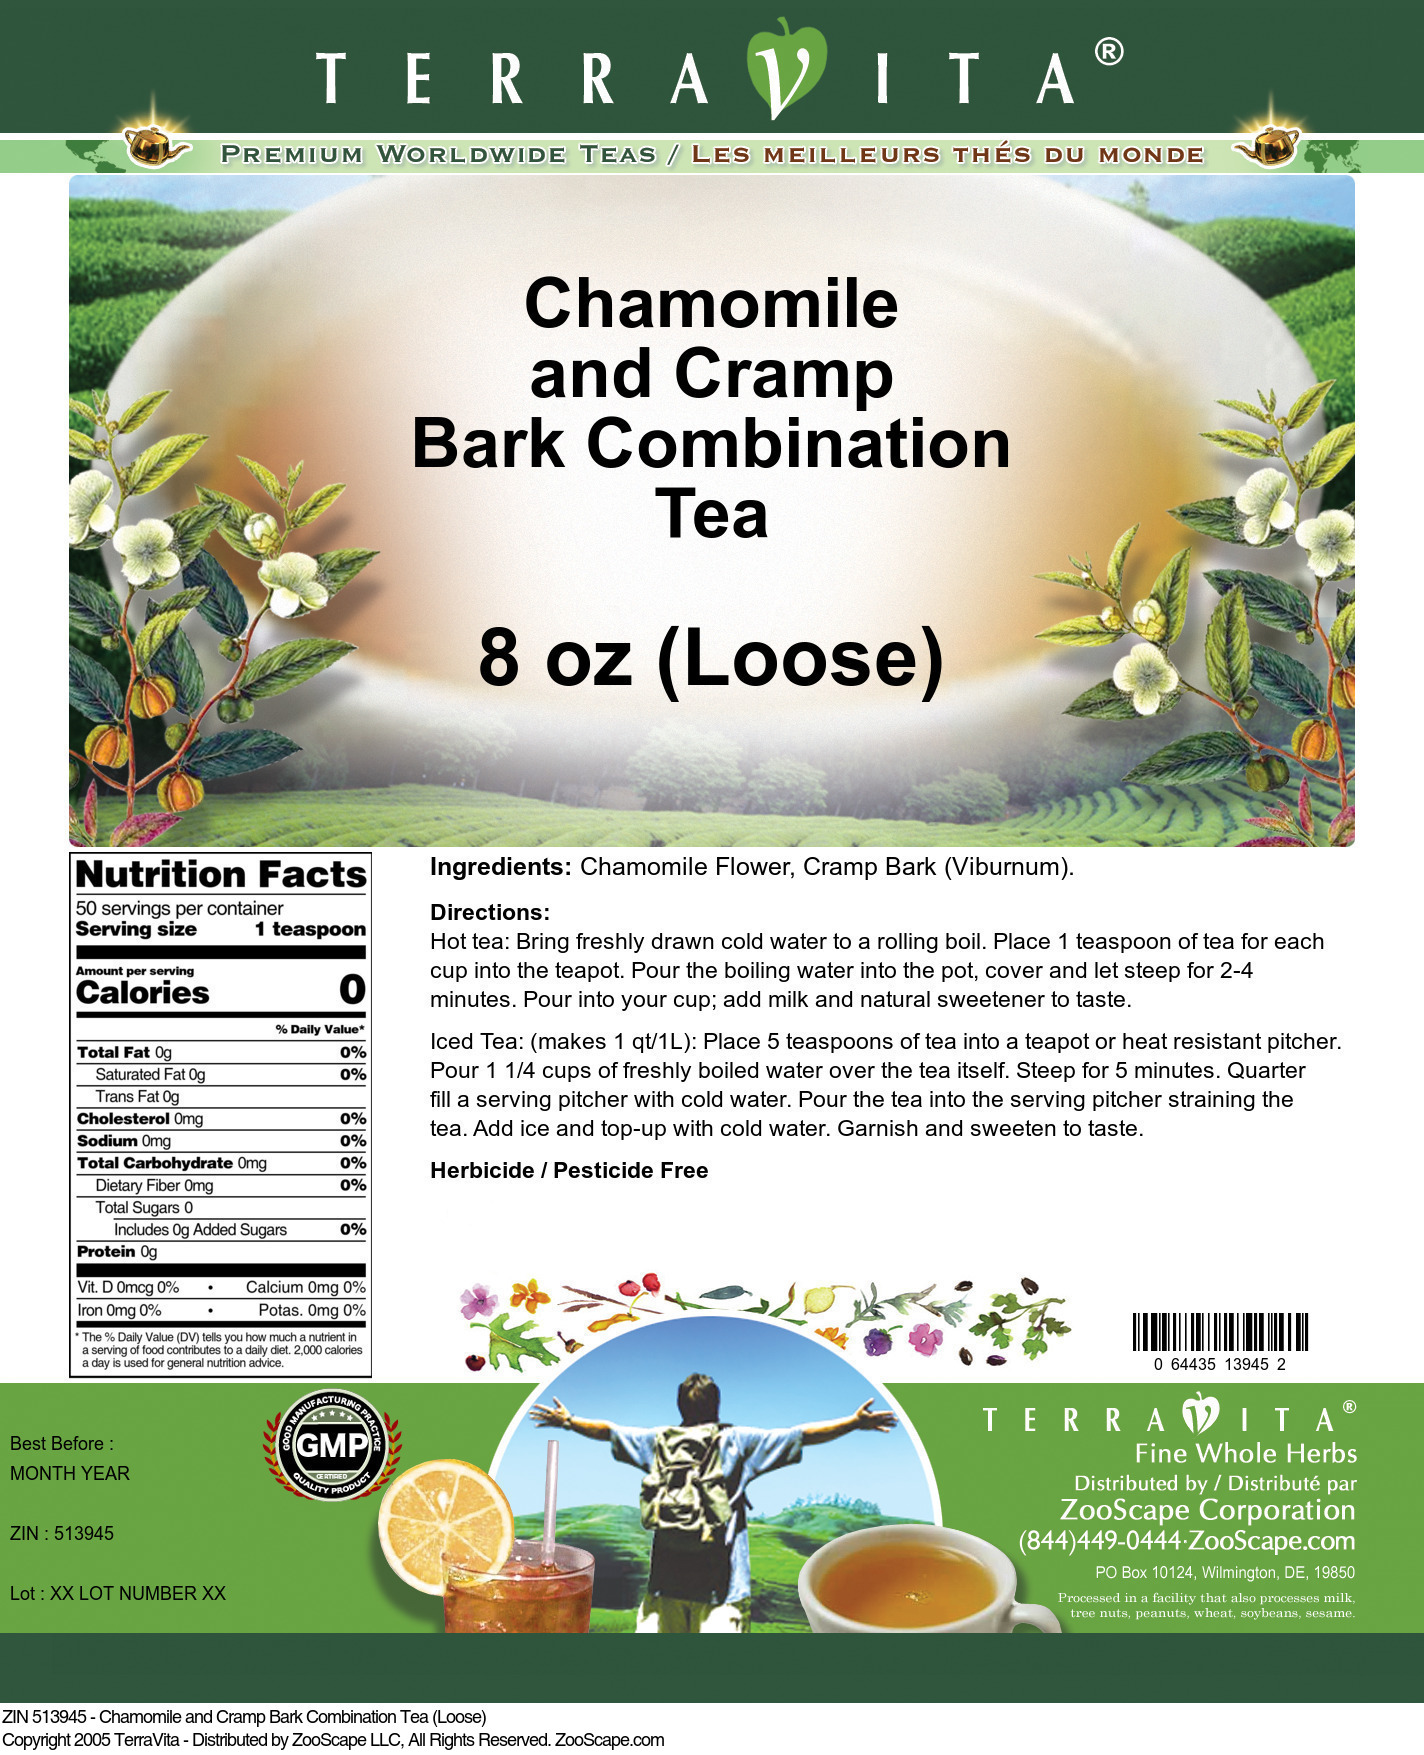 Chamomile and Cramp Bark Combination Tea (Loose)